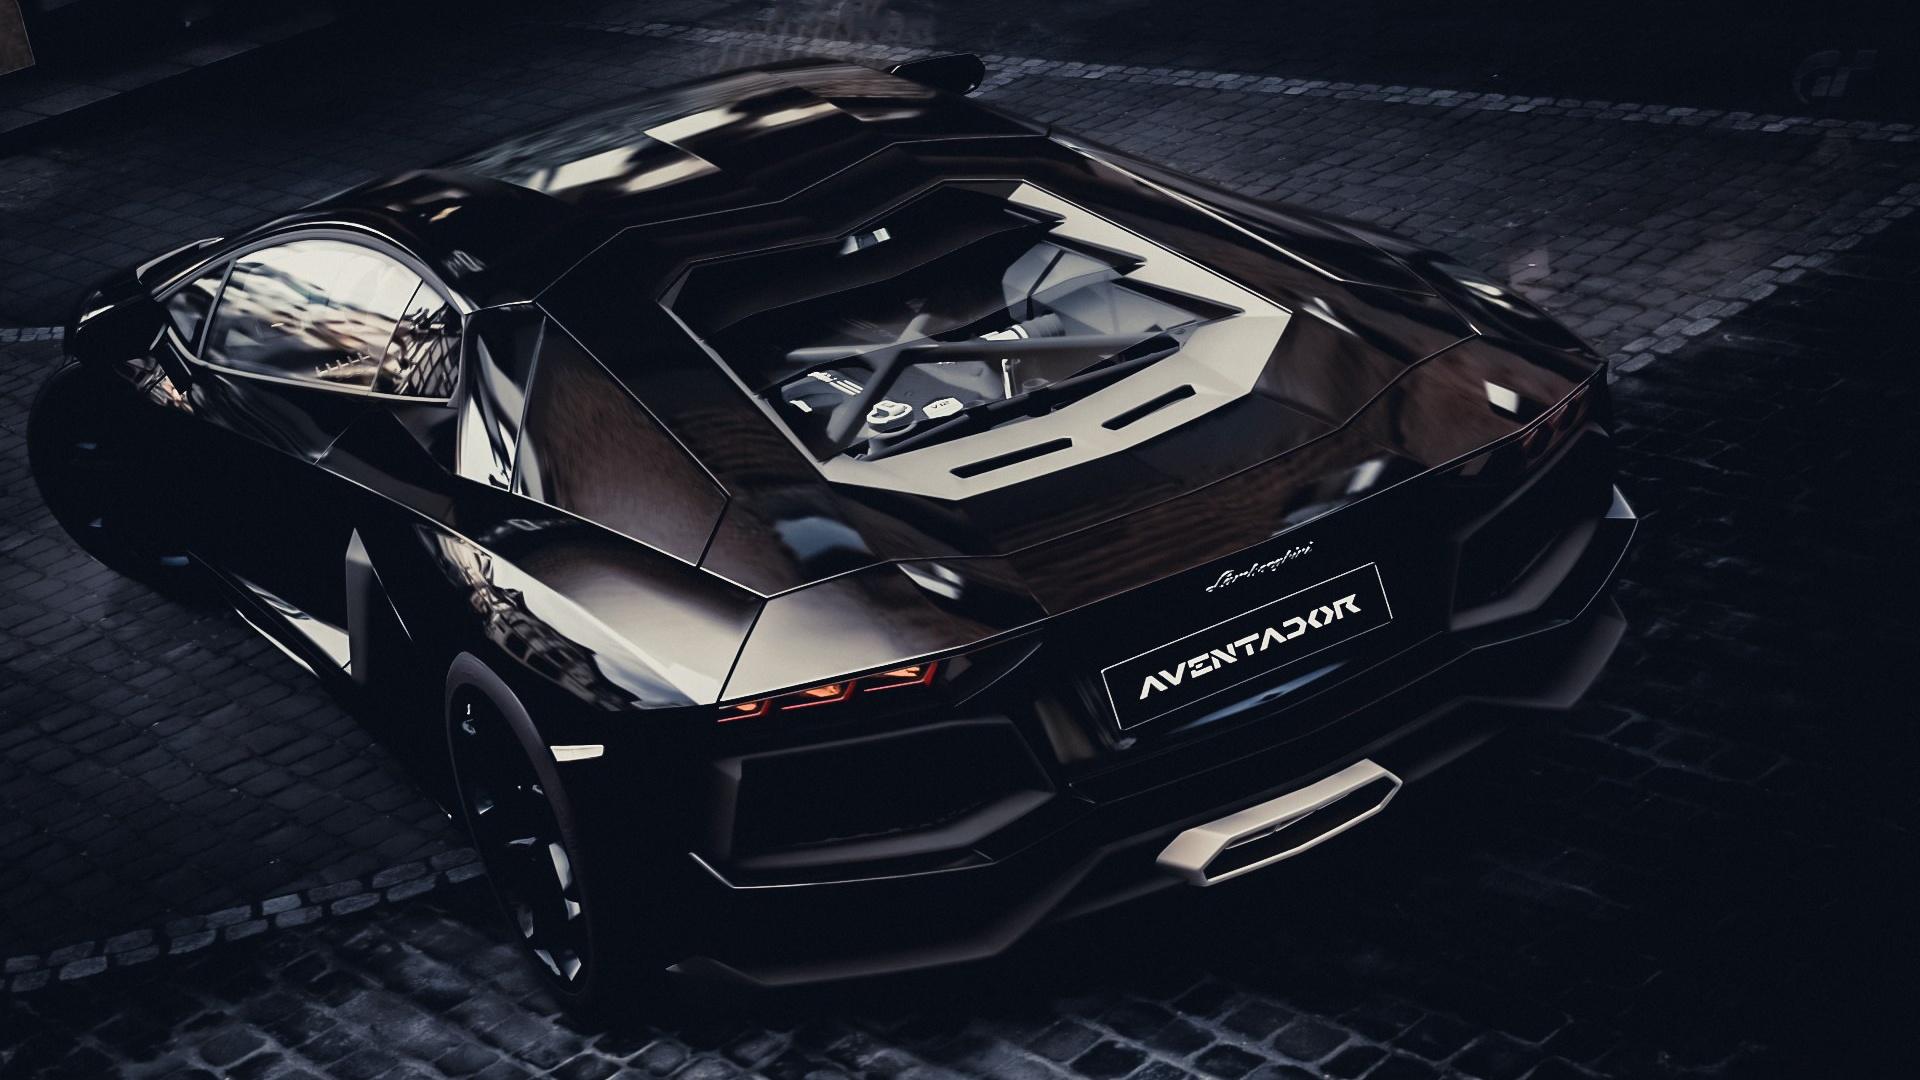 1920x1080 y image black background lamborghini 1080p. Lamborghini Dark Wallpapers Hd Pixelstalk Net